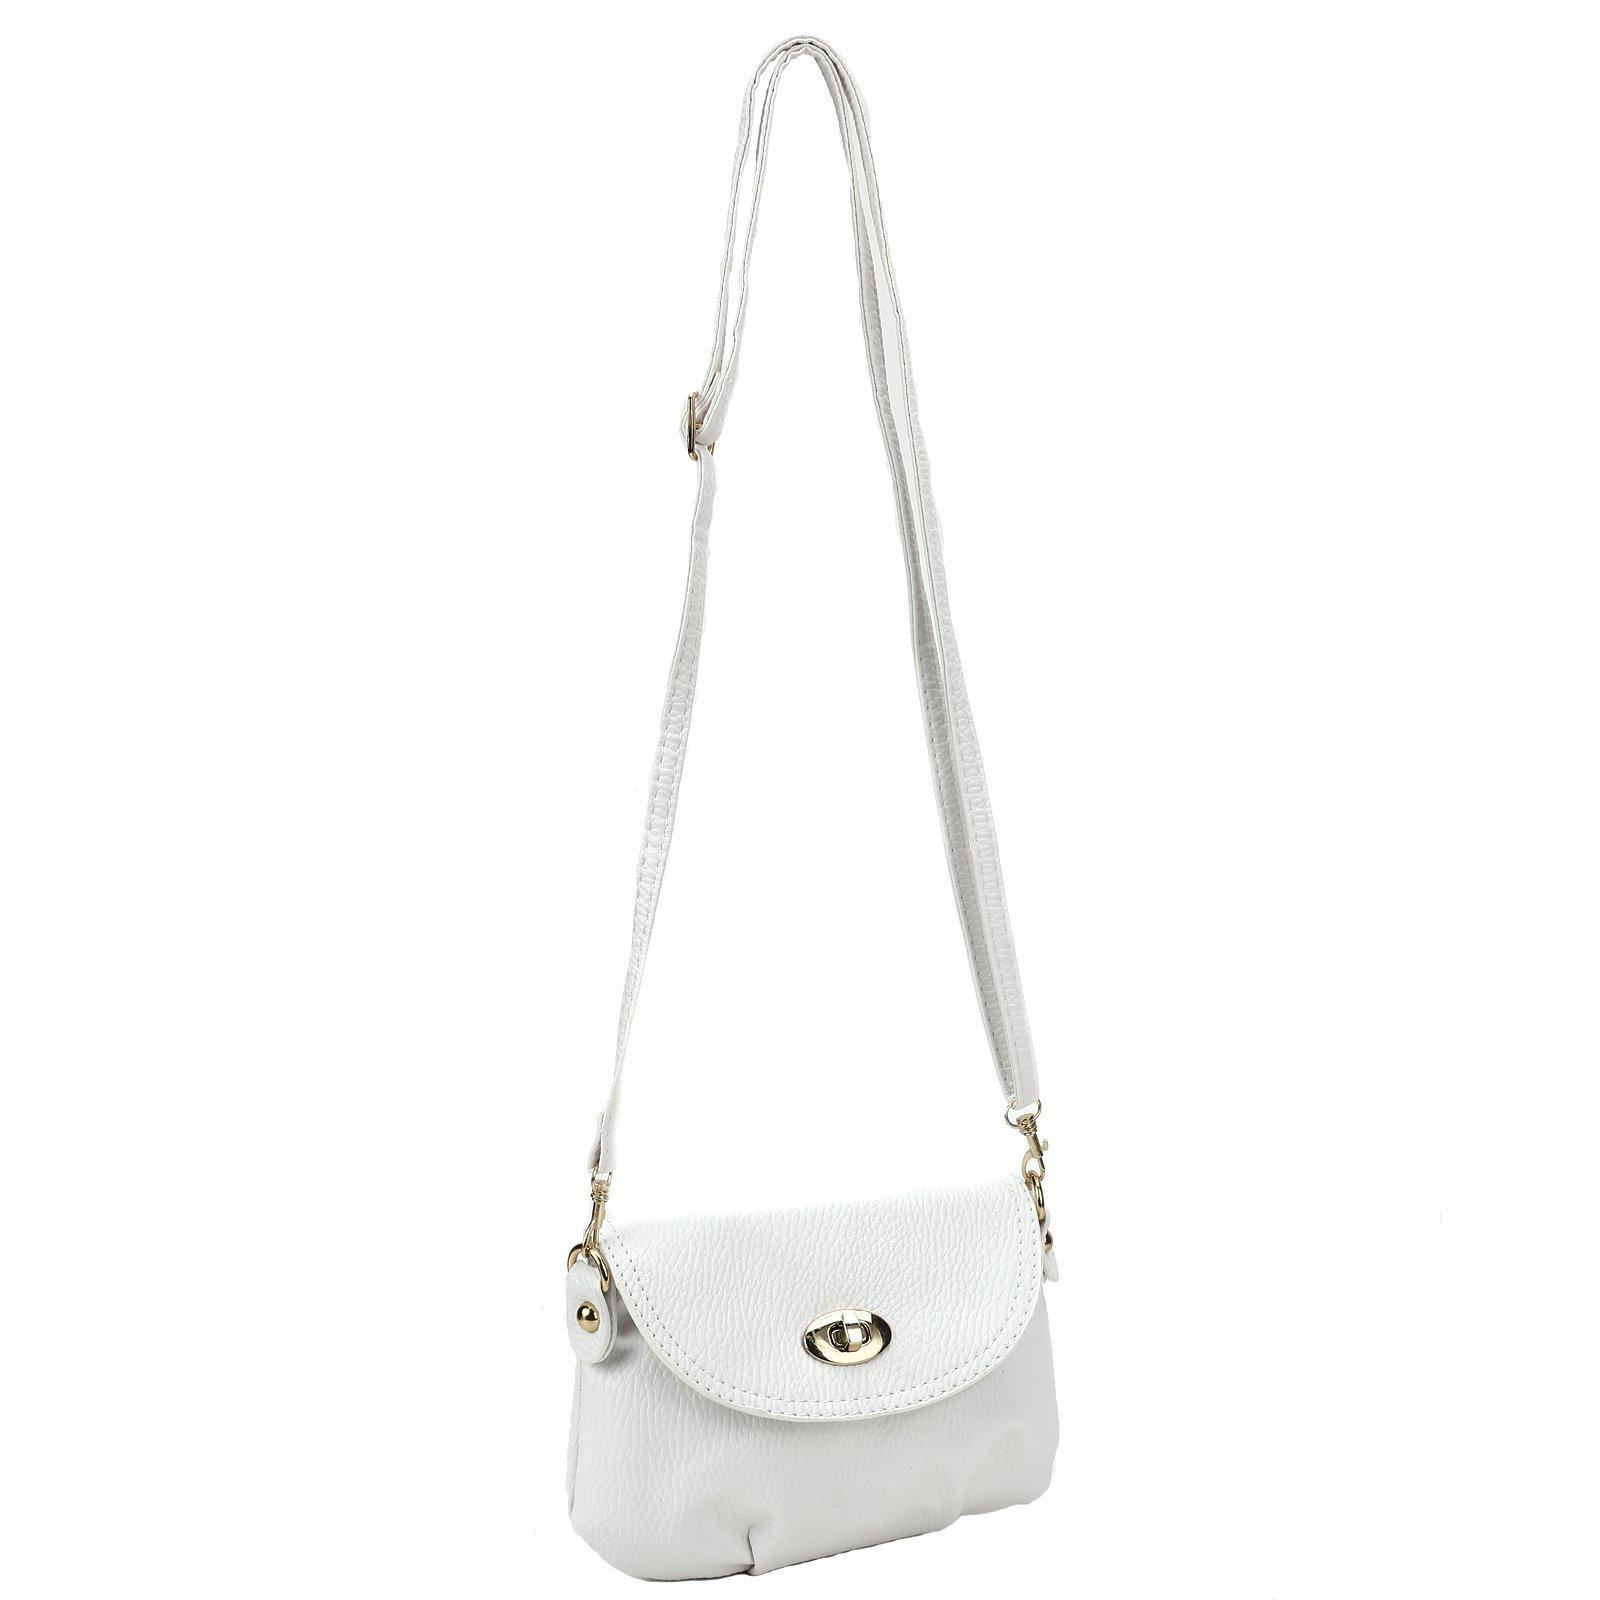 Ladies Mini SMALL Handbag Envelope Crossbody Shoulder Messenger Totes Bag Purse by Anladia (Image #1)